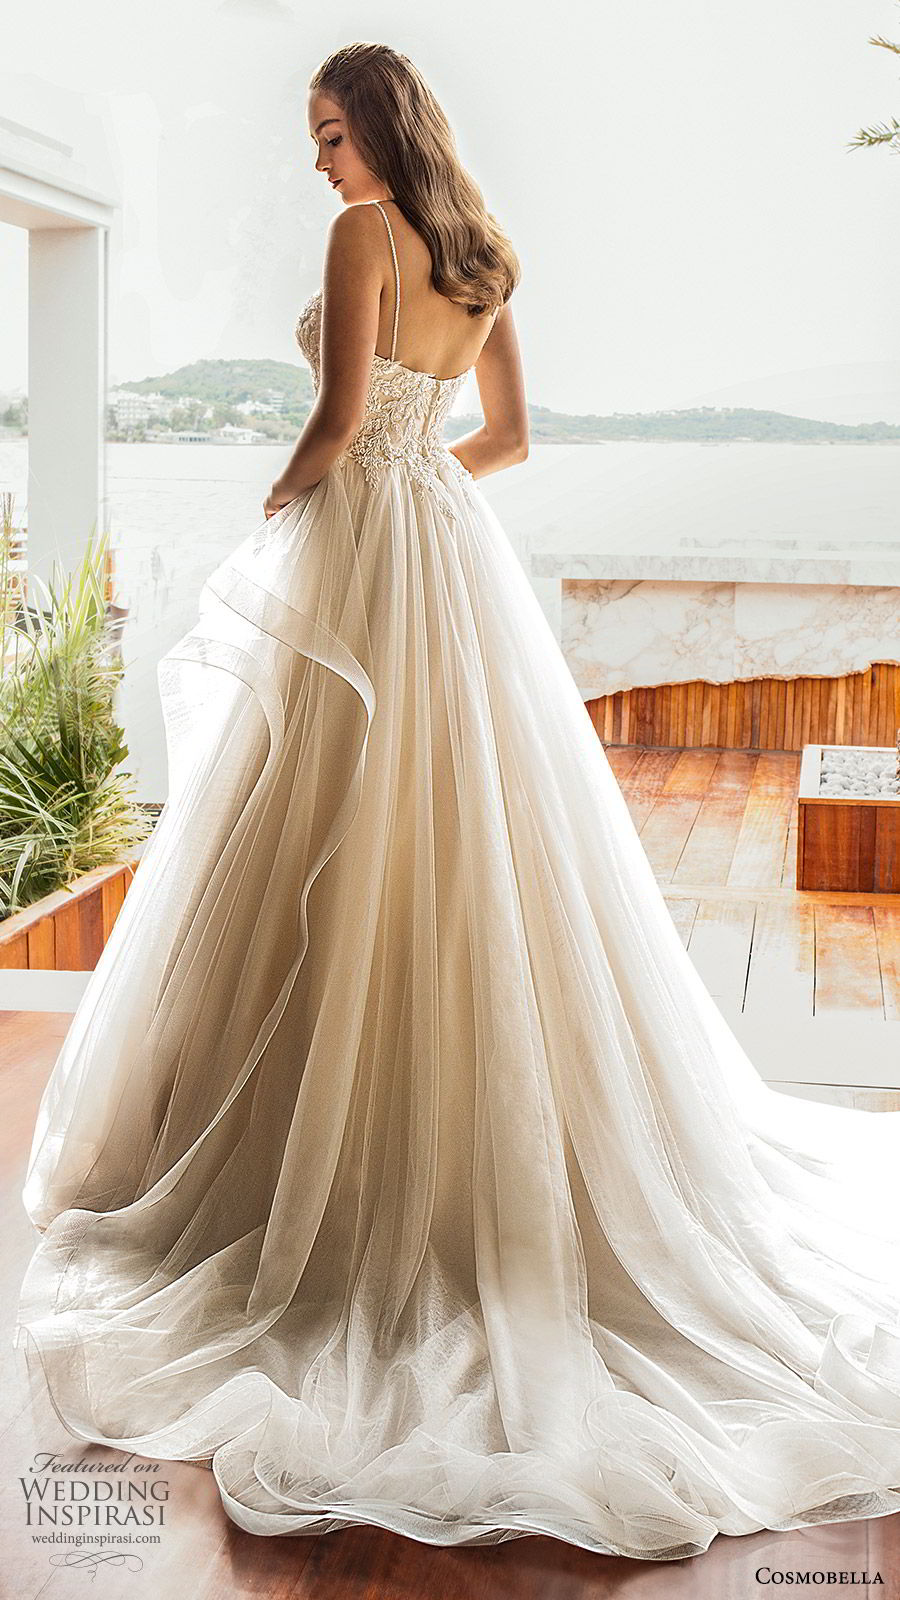 cosmobella 2020 bridal sleeveless thin straps embellished bodice a line ball gown wedding dress (14) romantic princess tiered skirt chepel train bv